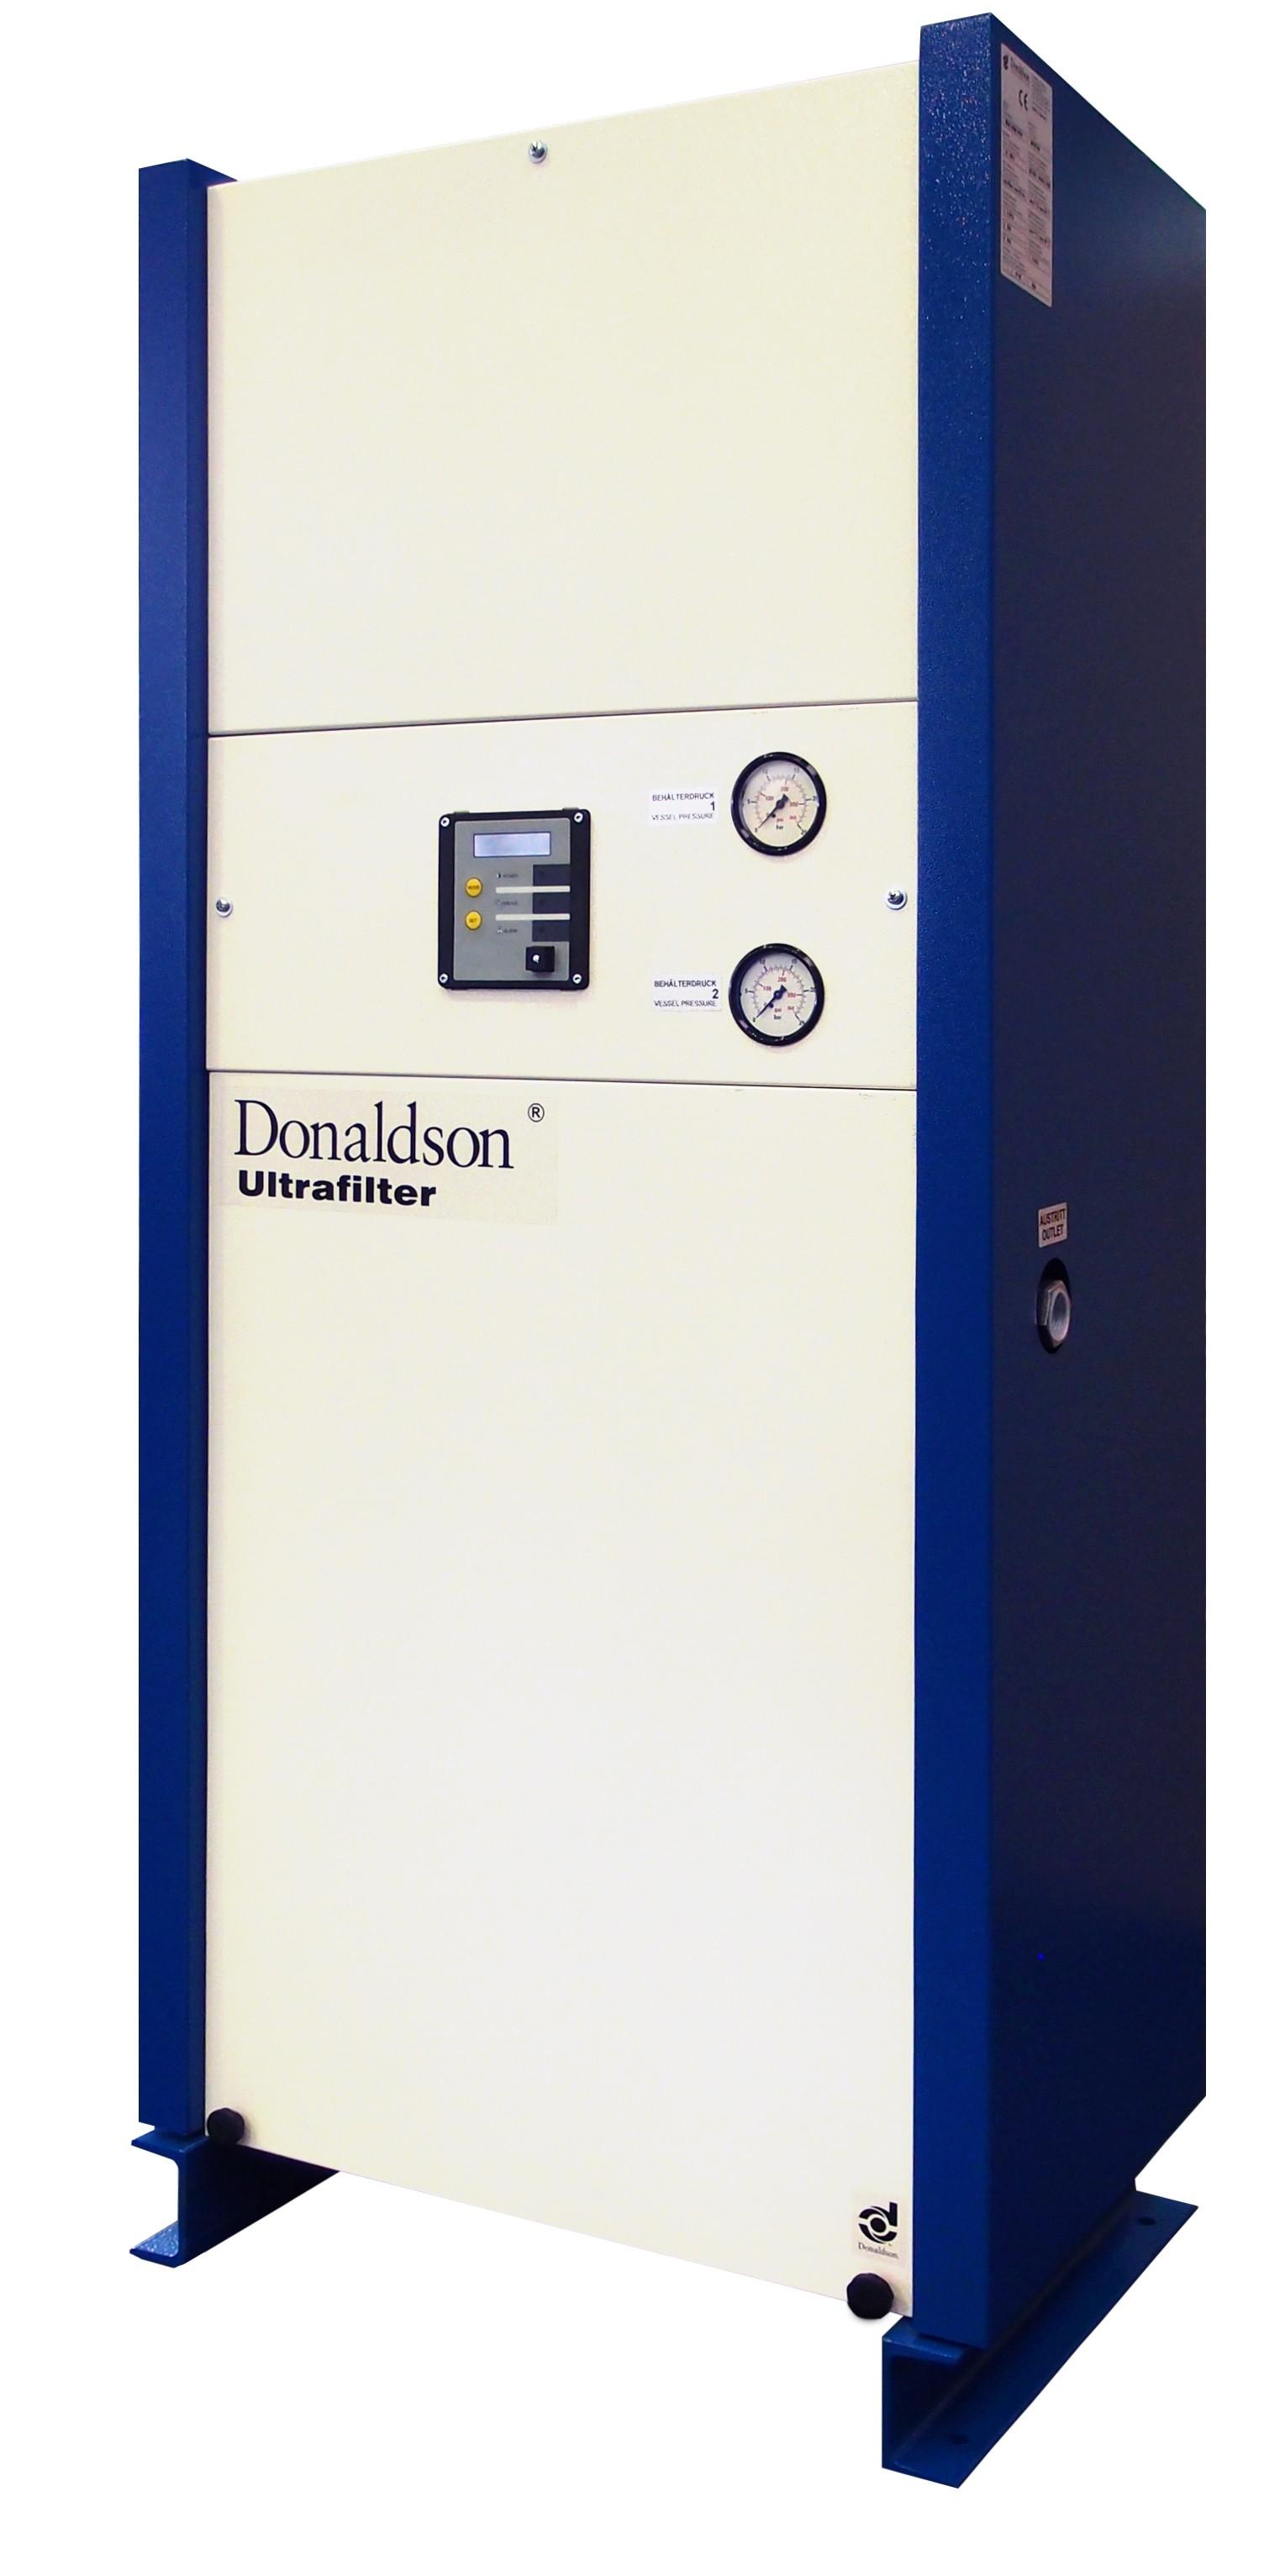 Adsorptionstrockner (Donaldson)